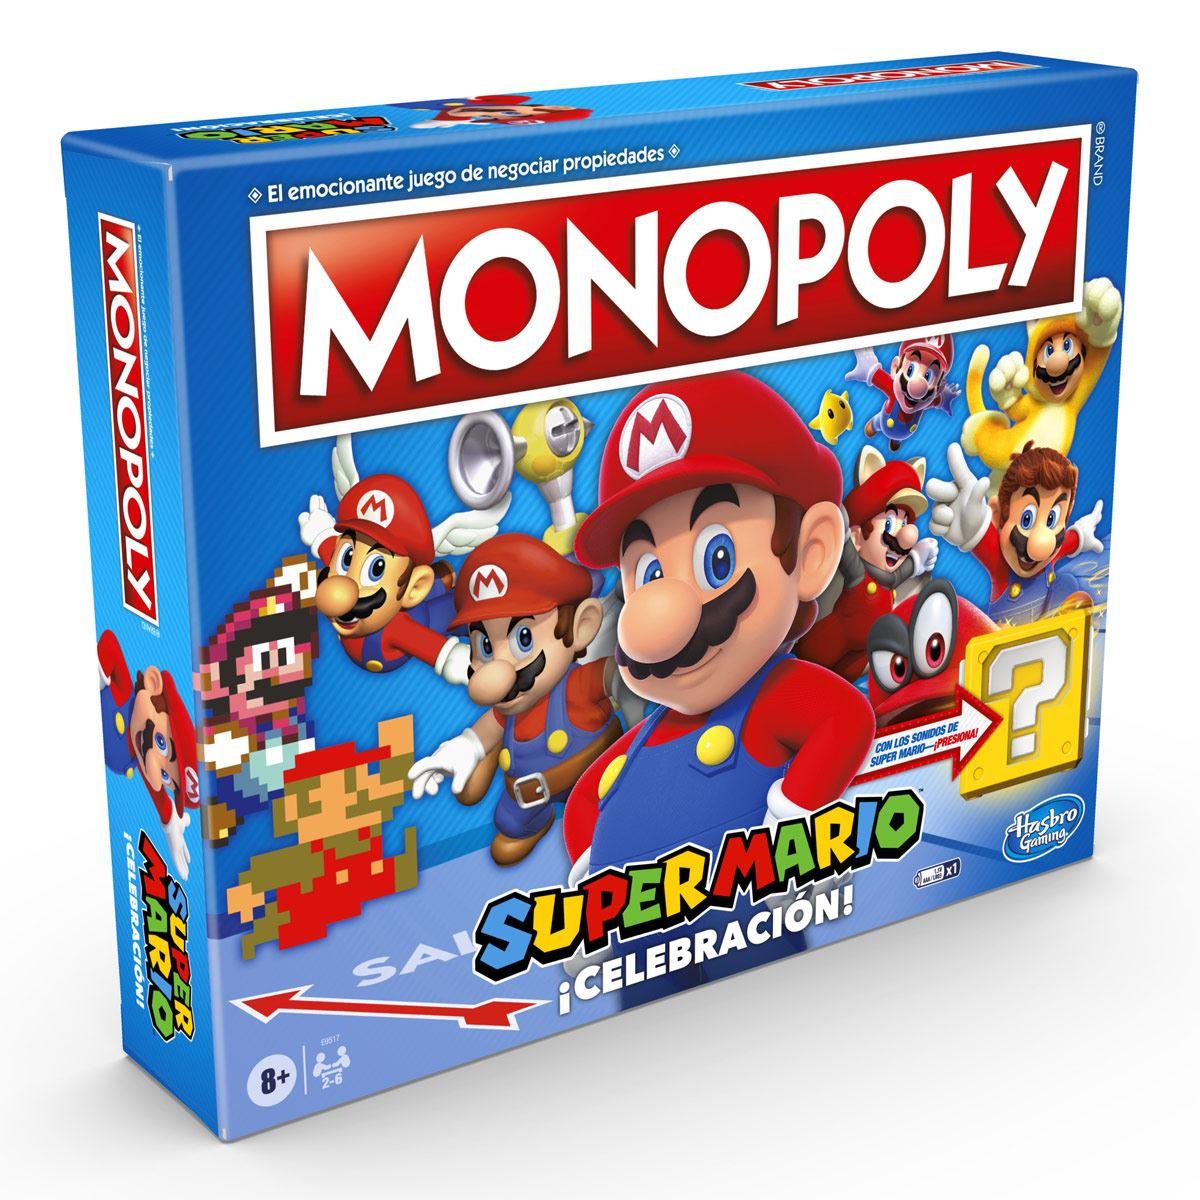 Monopoly Super Mario ¡Celebración!